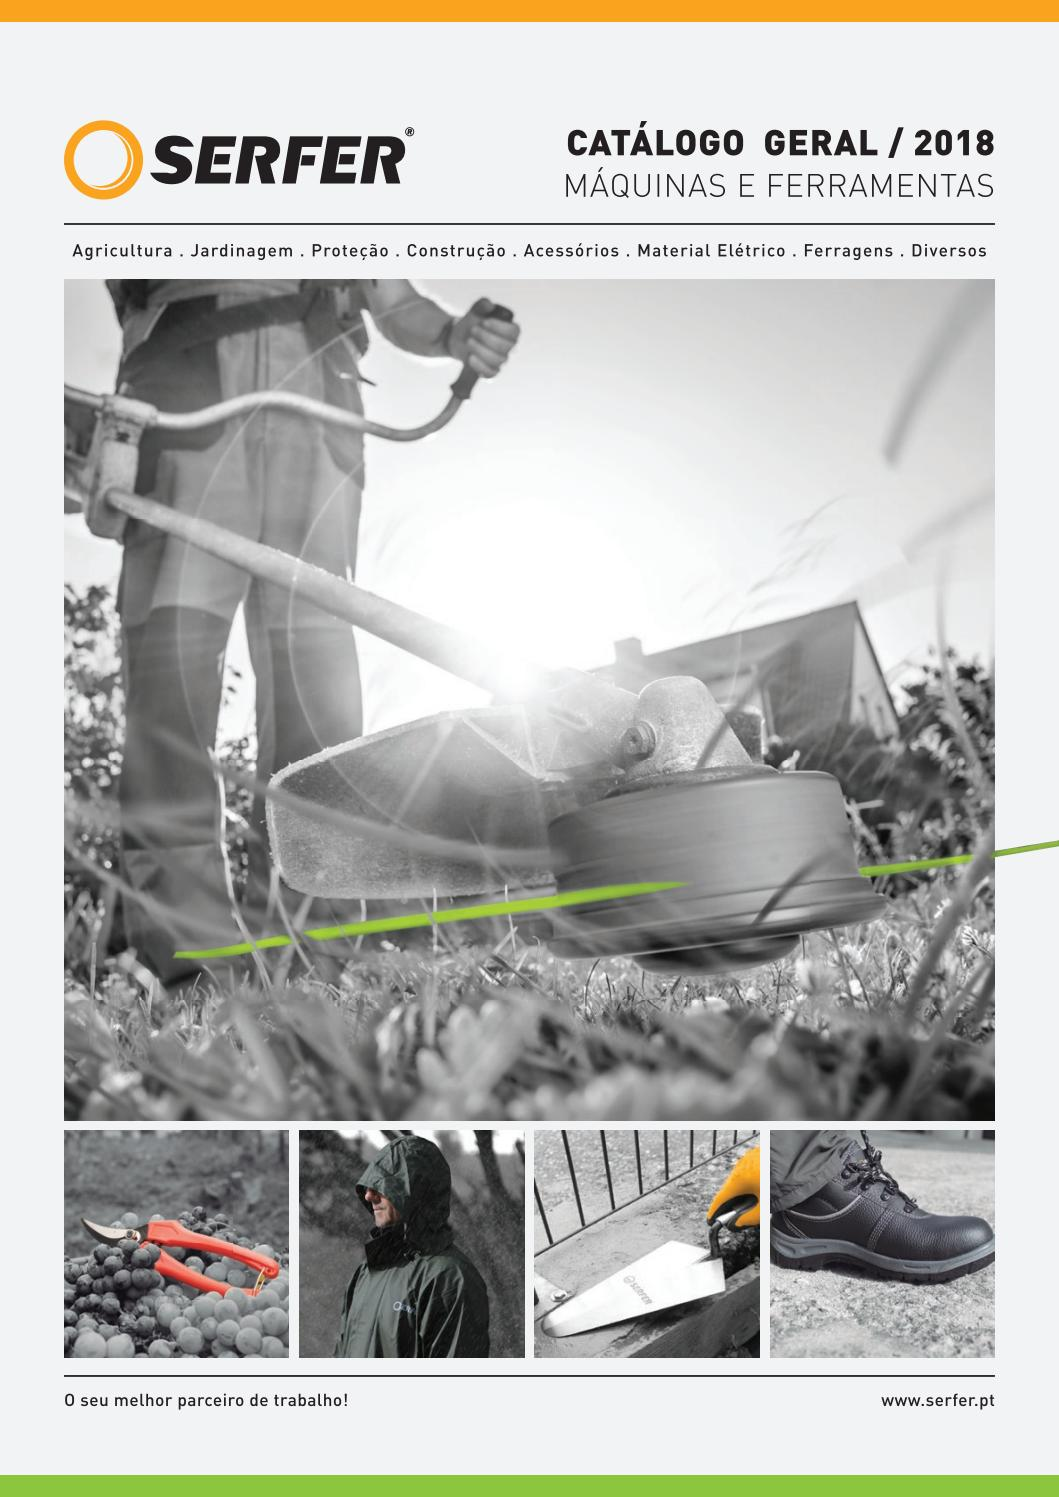 893d3735bc9cb Catálogo Geral SERFER - 2018 by JSR. - issuu